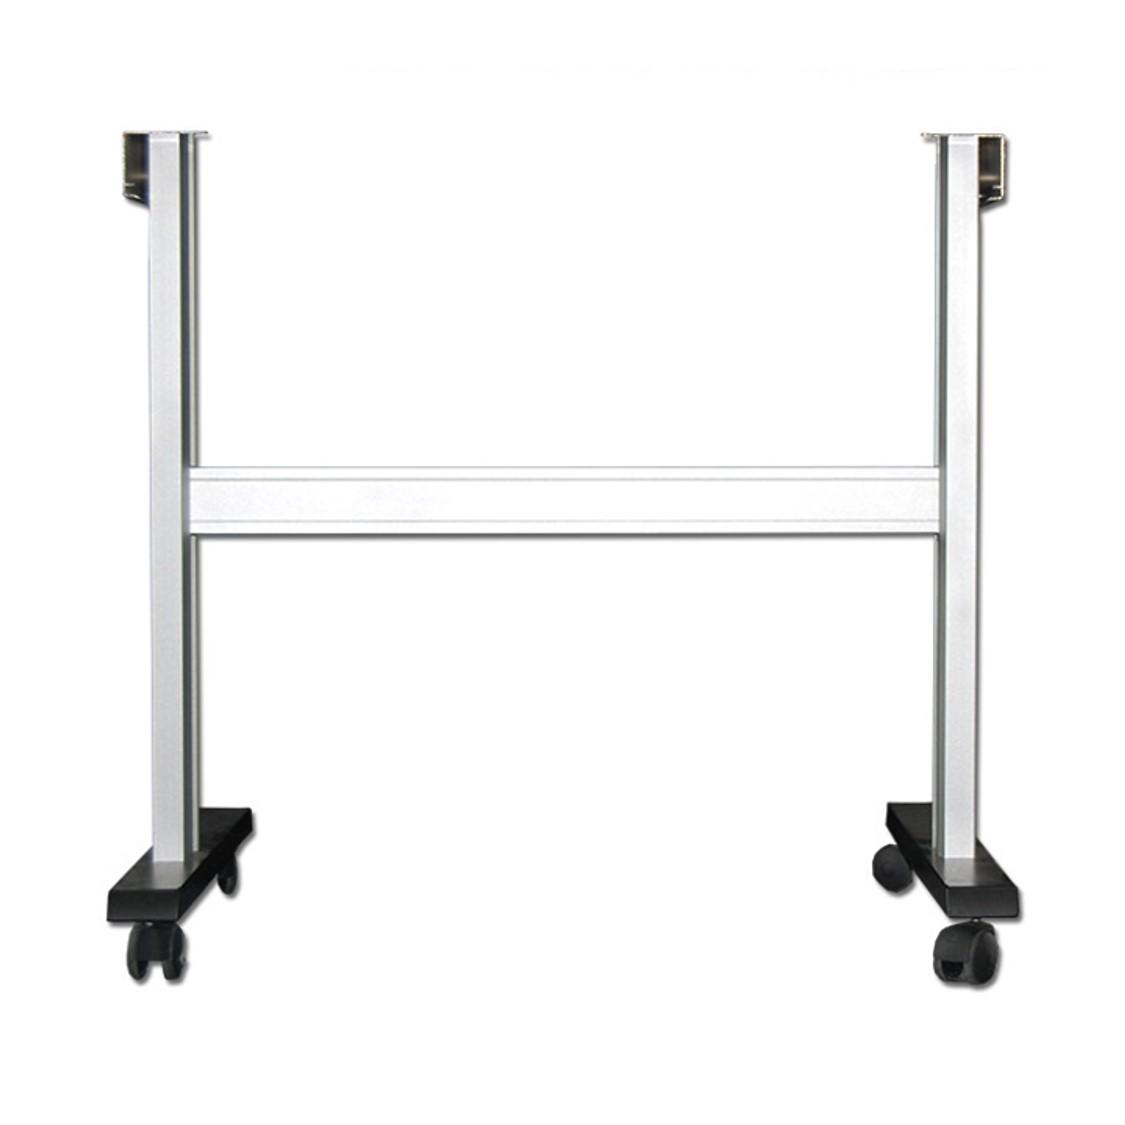 Graphtec CE6000 Stand | Spare Parts | Graphtec GB